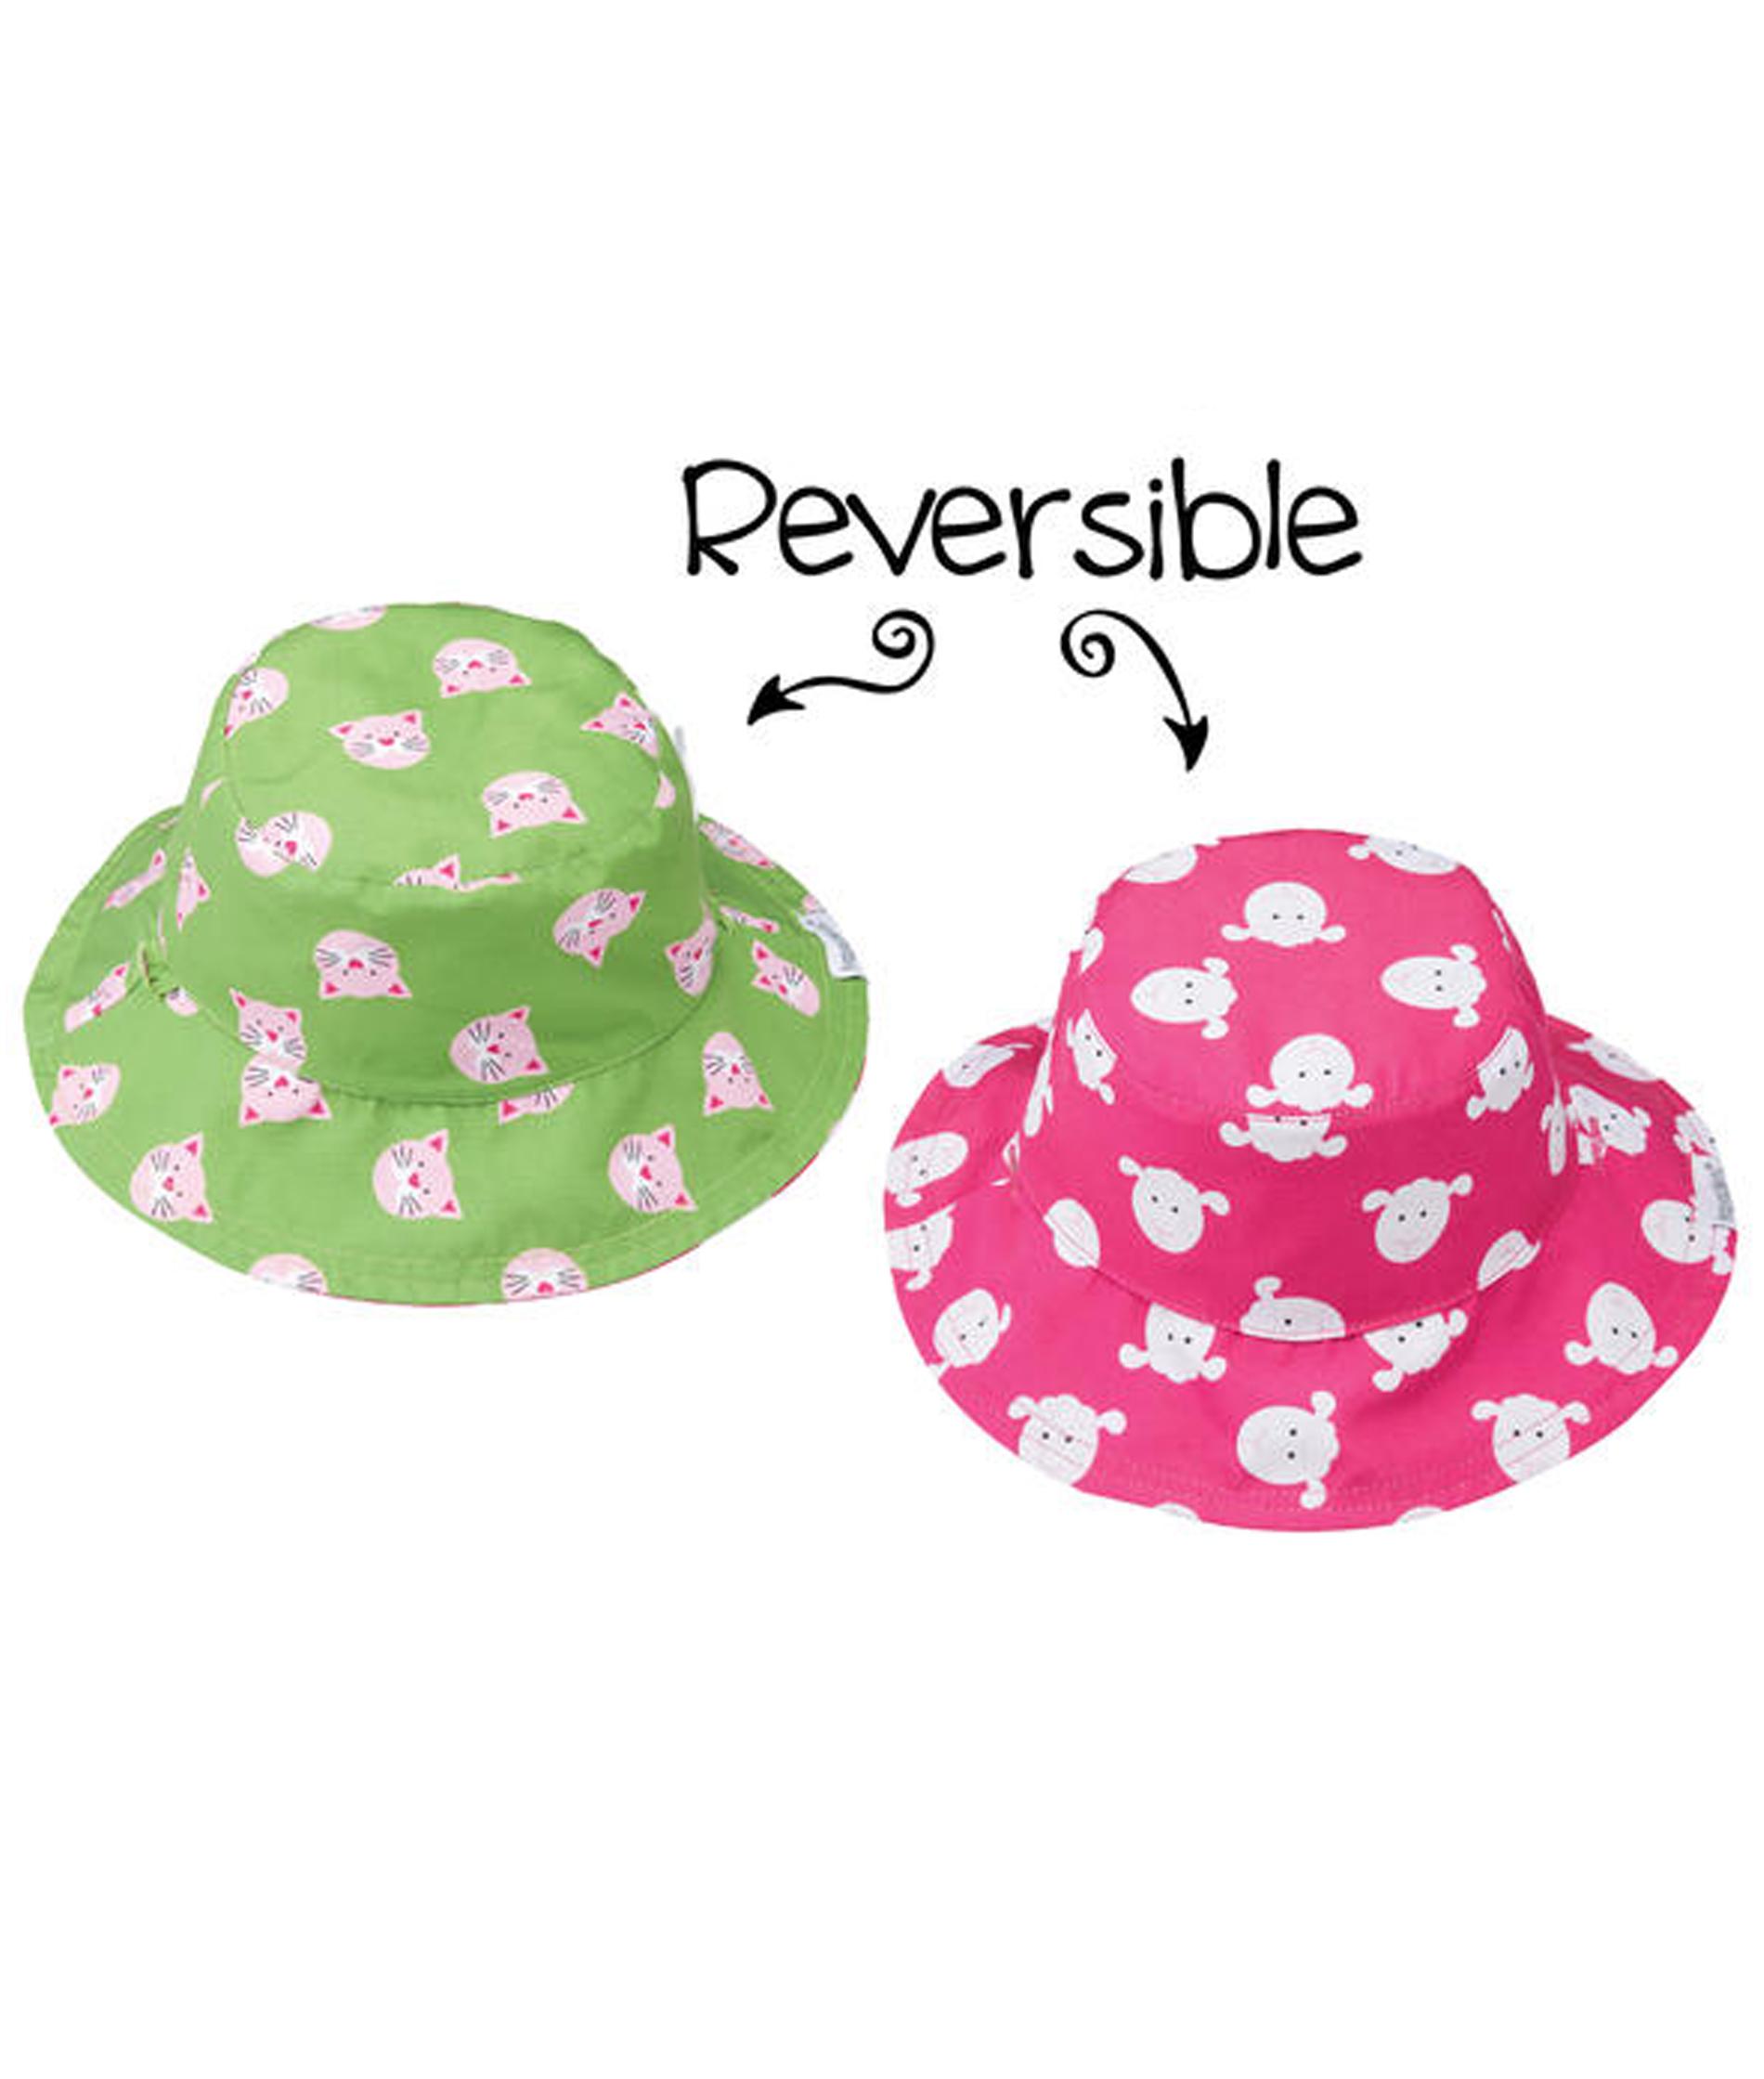 Flapjack Kids Baby Reversible Patterned Sun Hats - Kitten/Lamb